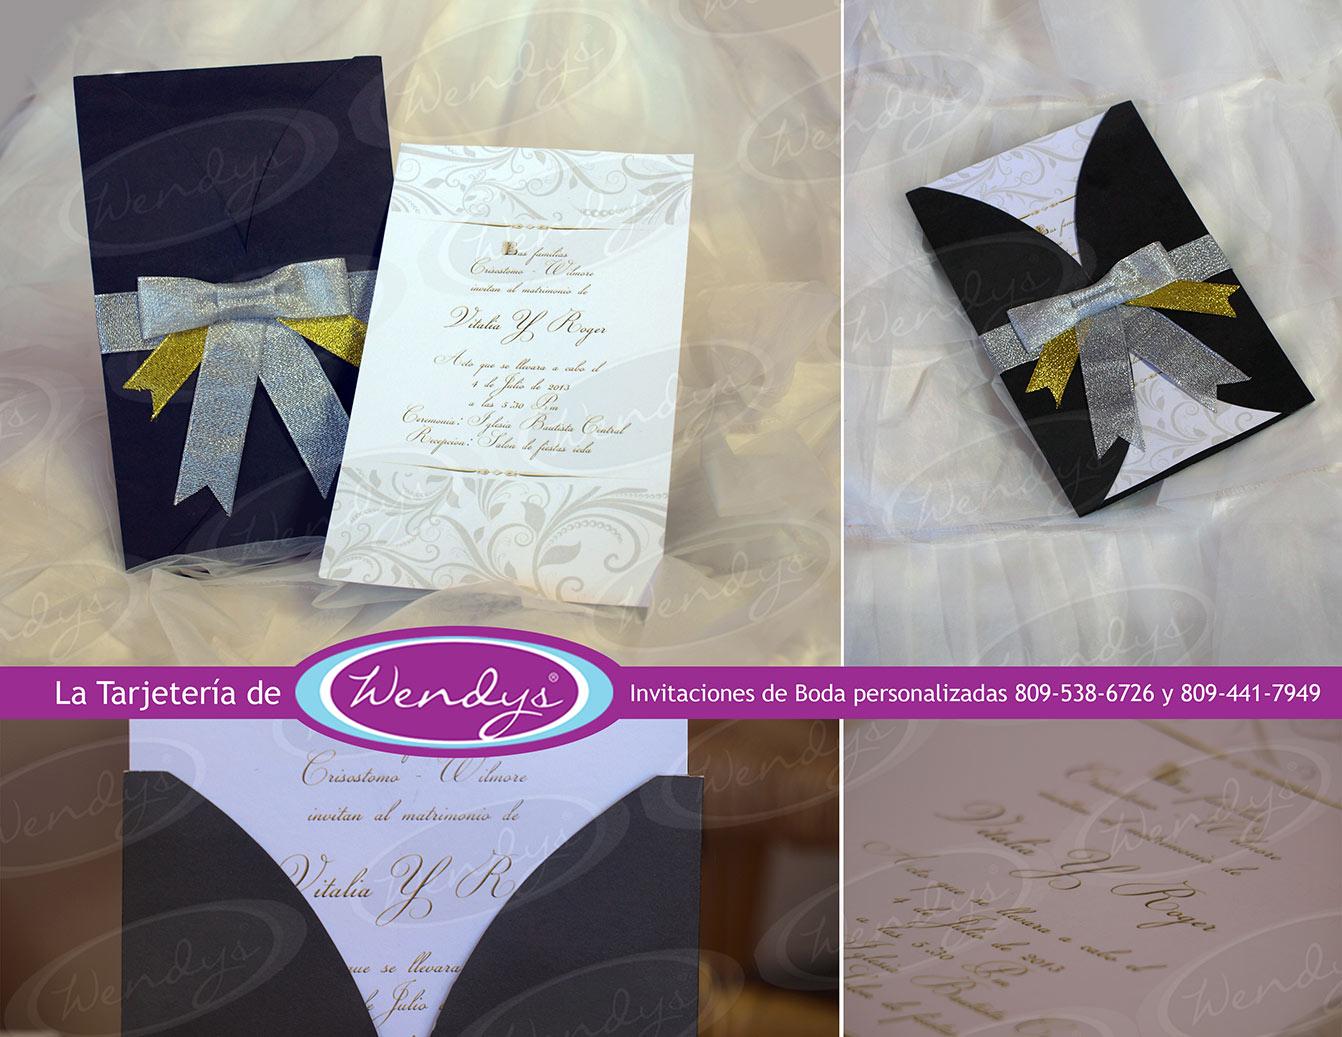 Invitaciones de boda pictures to pin on pinterest tattooskid - Tarjeta de boda ...